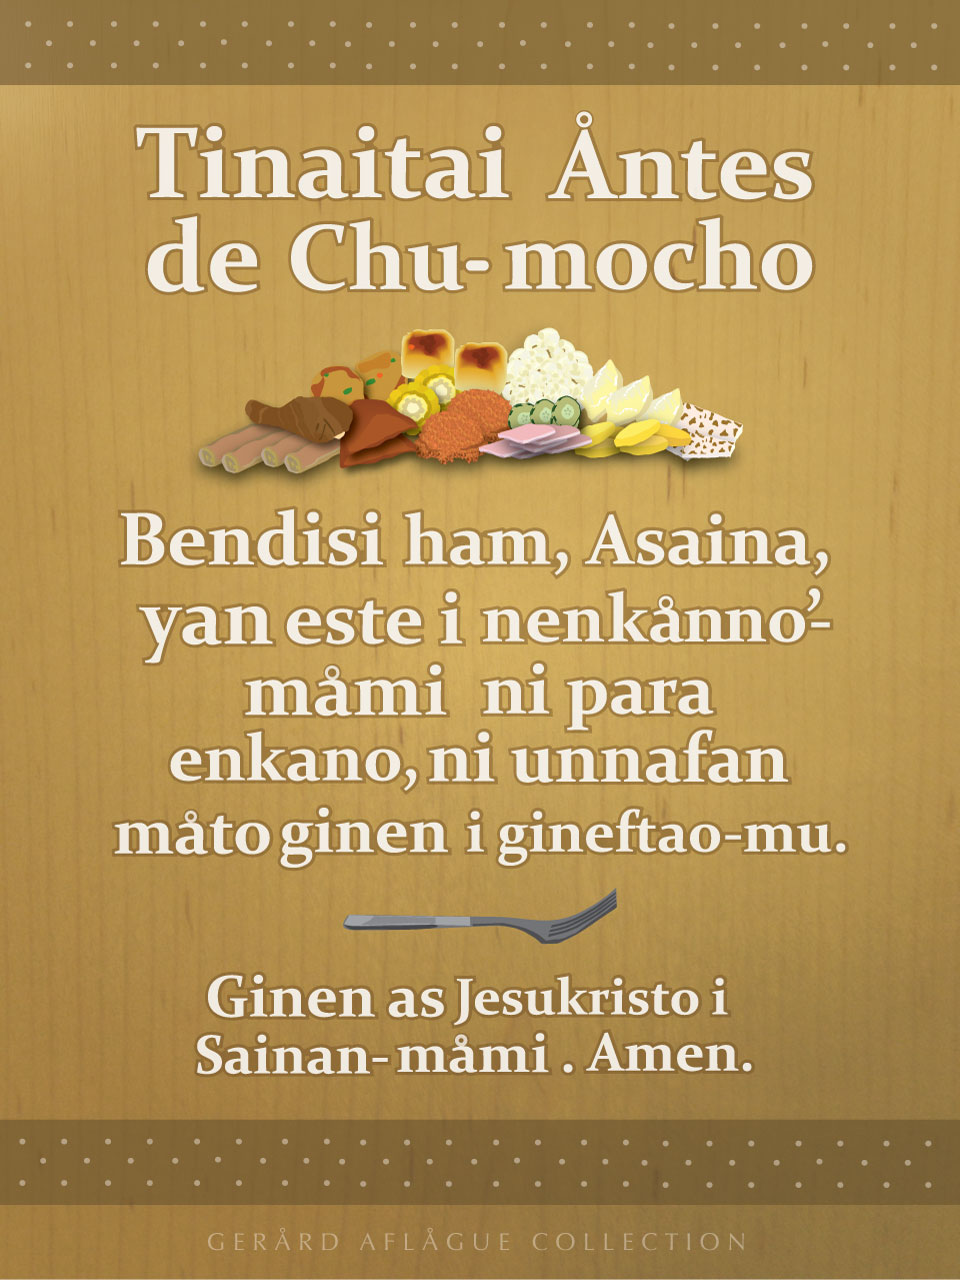 chamorro prayer before a